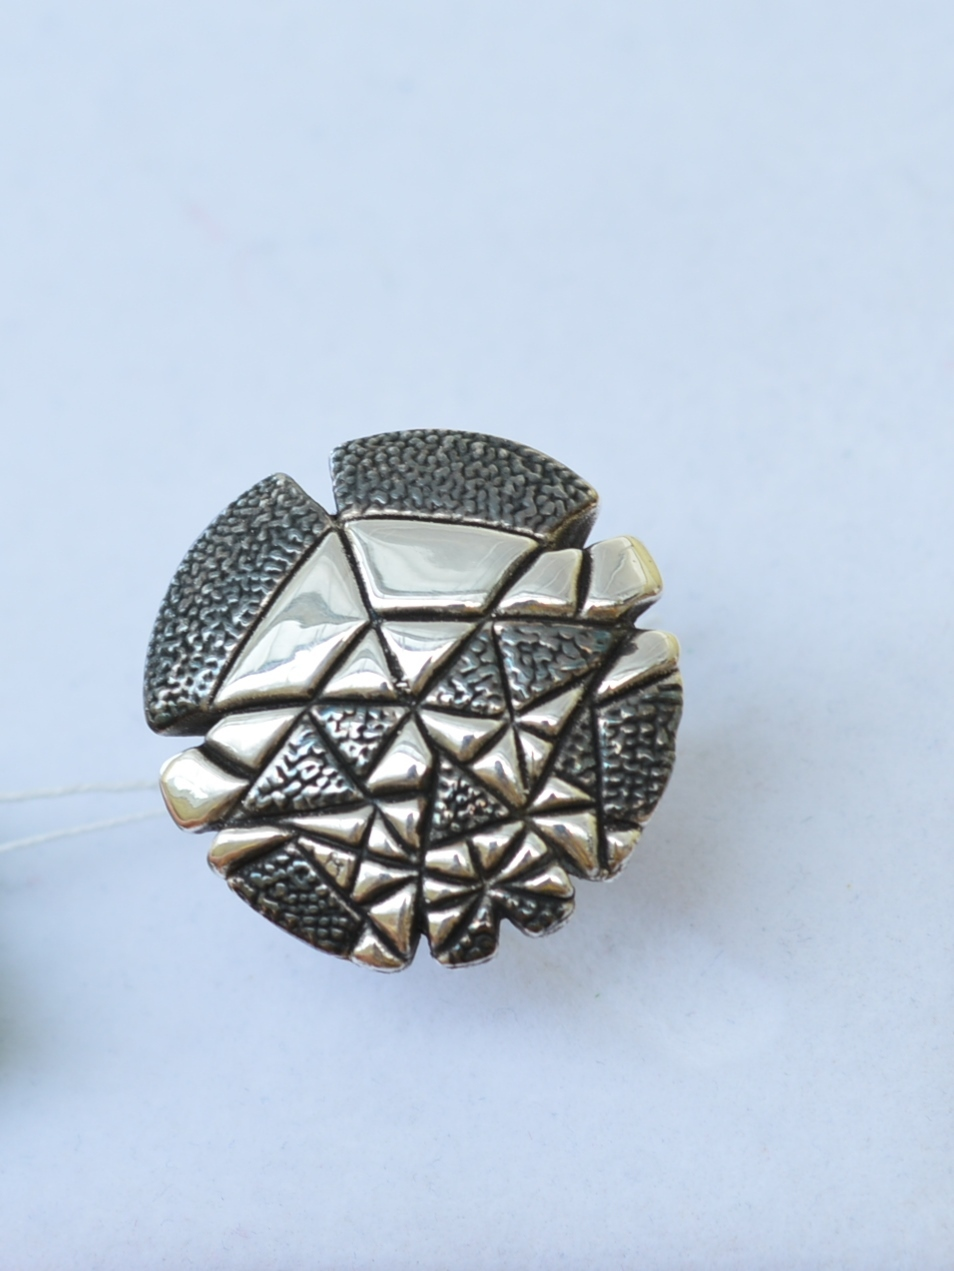 Мозаика-круг (кольцо из серебра)